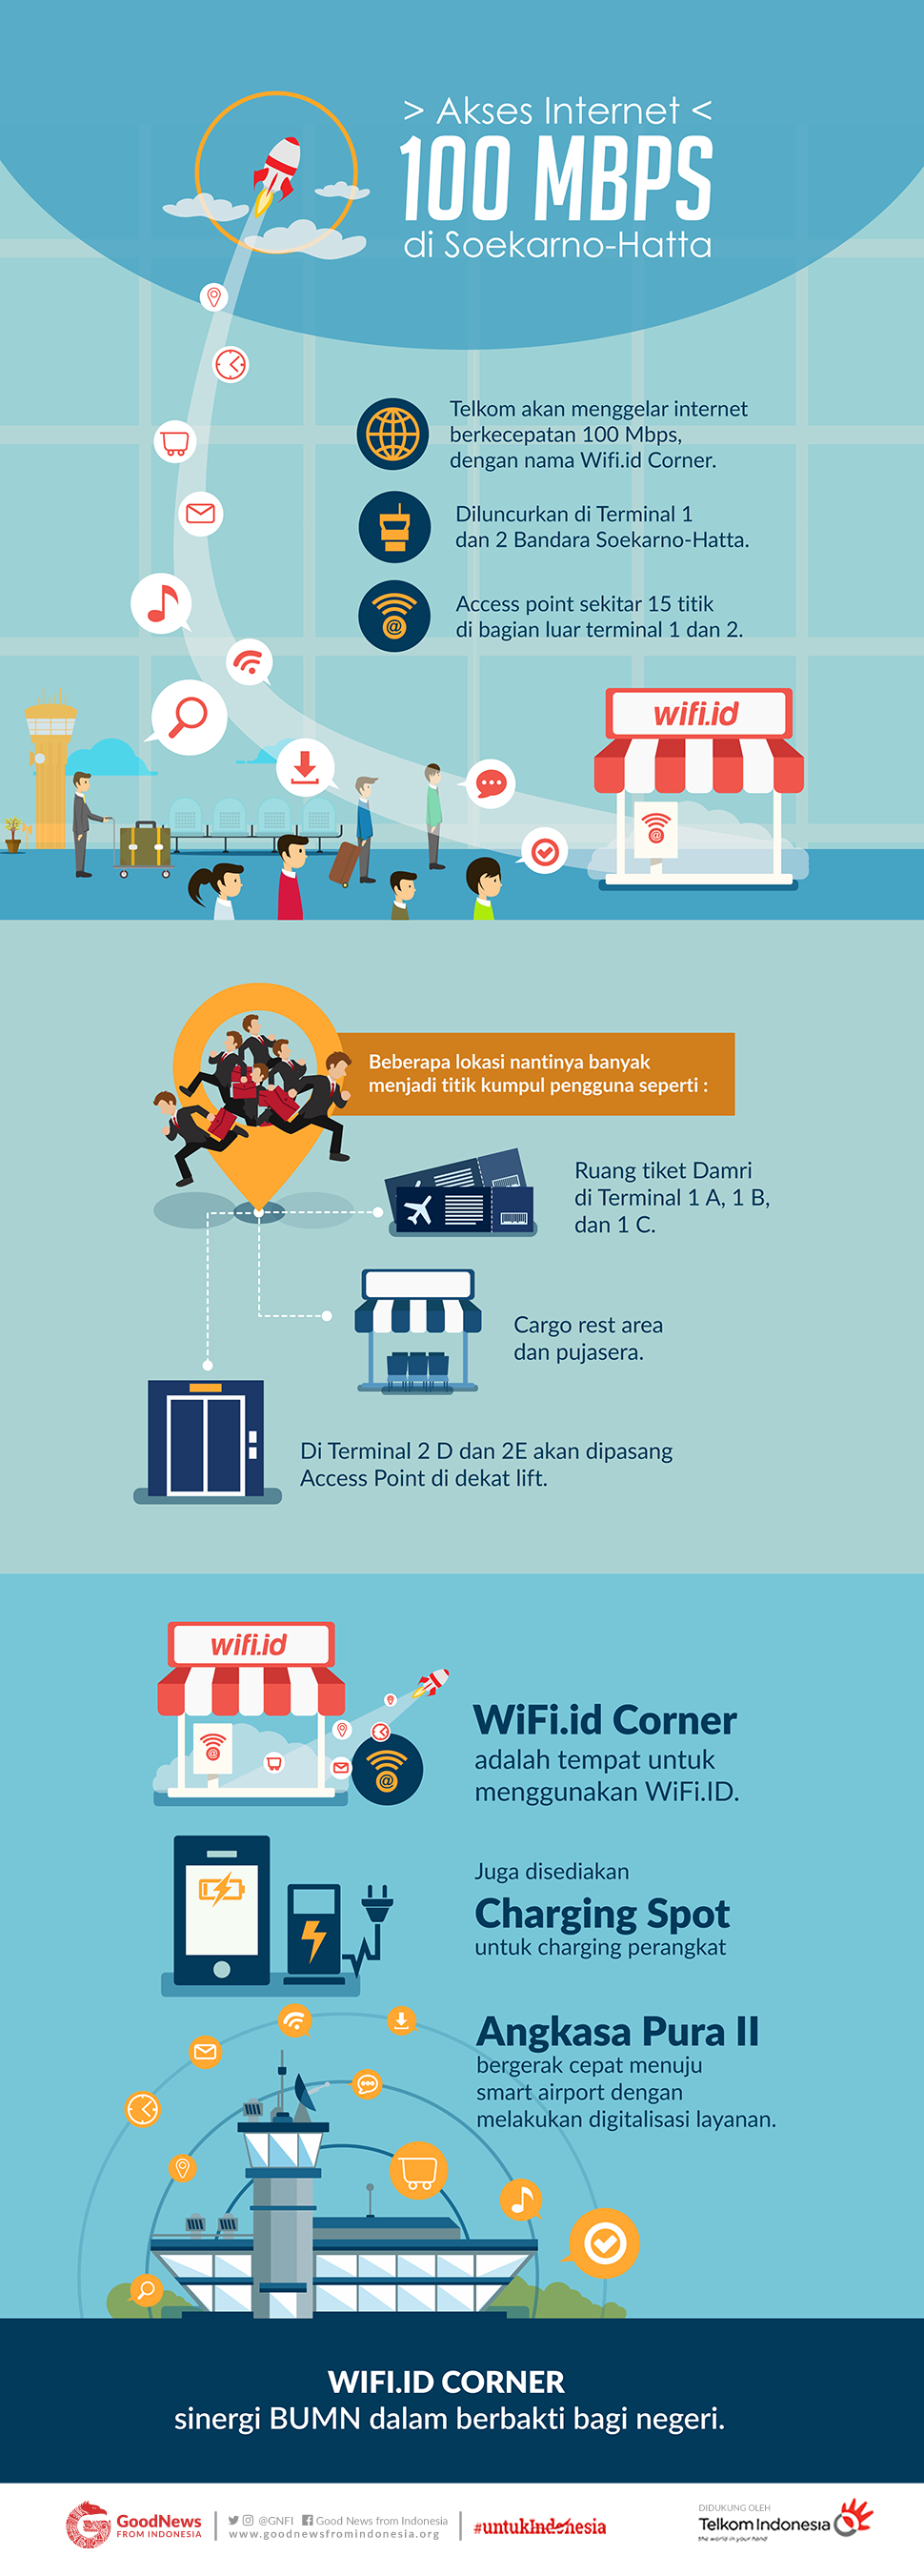 Akses internet 100 mbps di Soekarno-Hatta